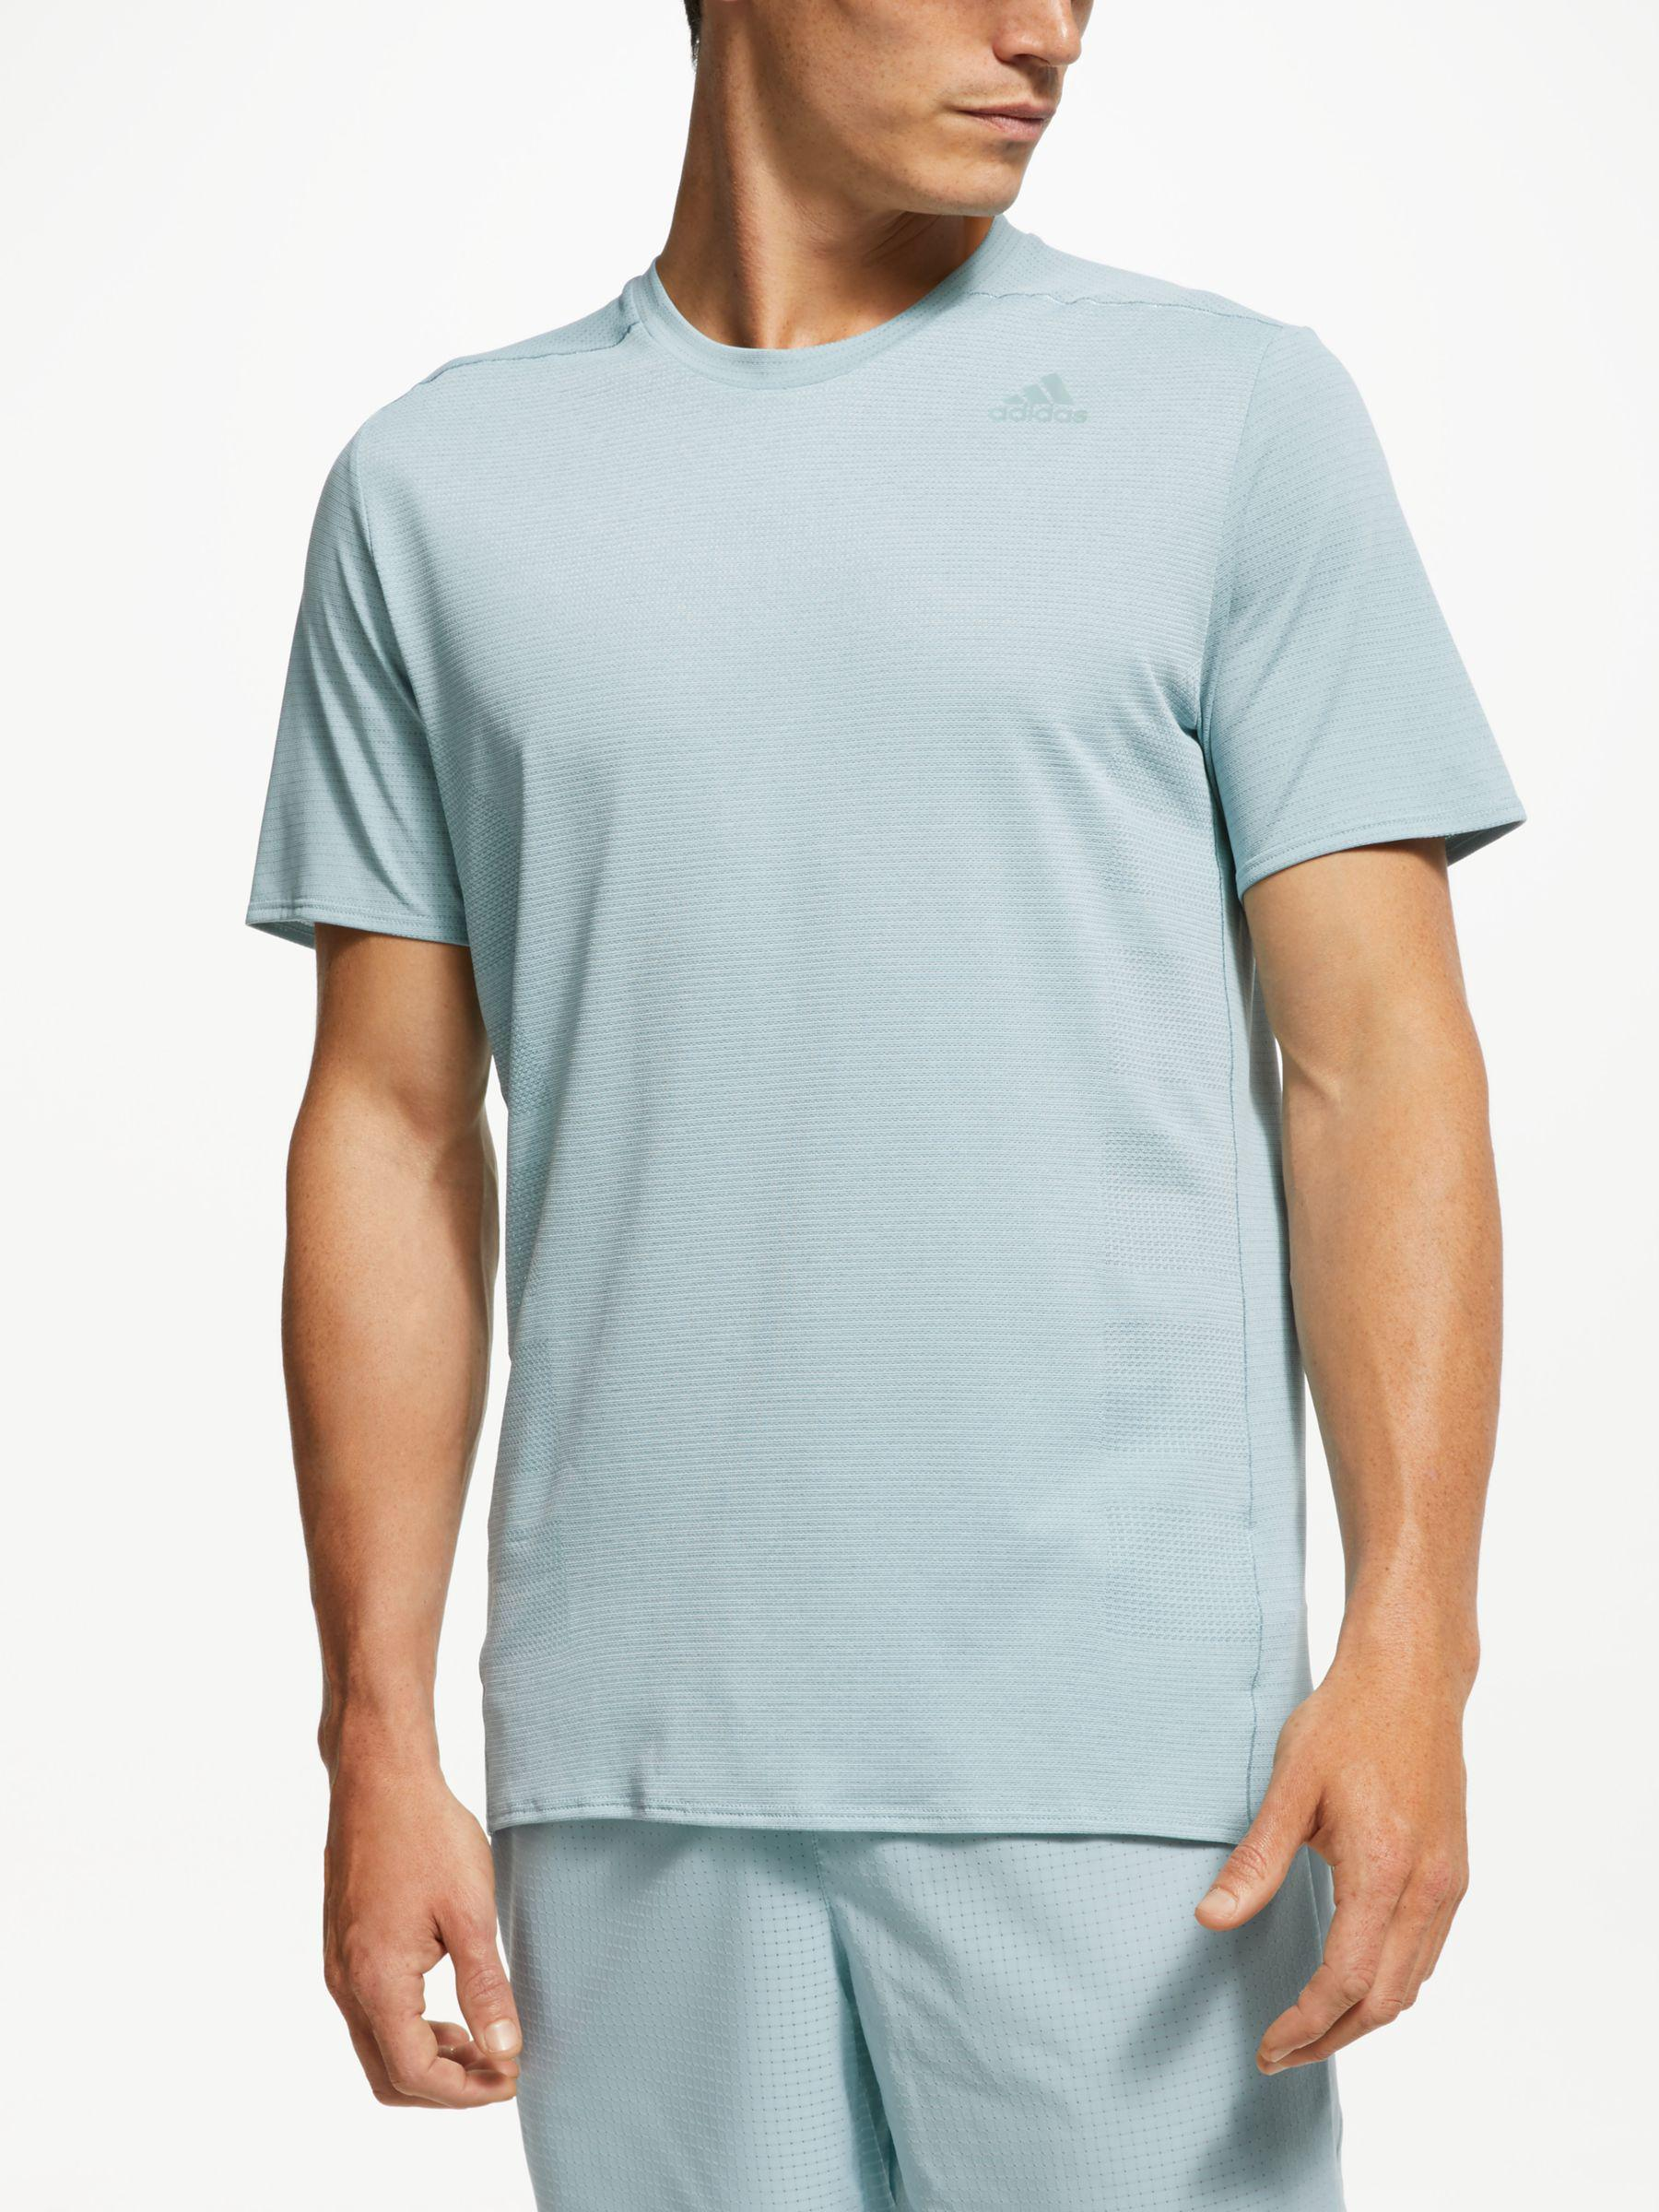 b3f557f1a Adidas Supernova Running T-shirt in Blue for Men - Lyst